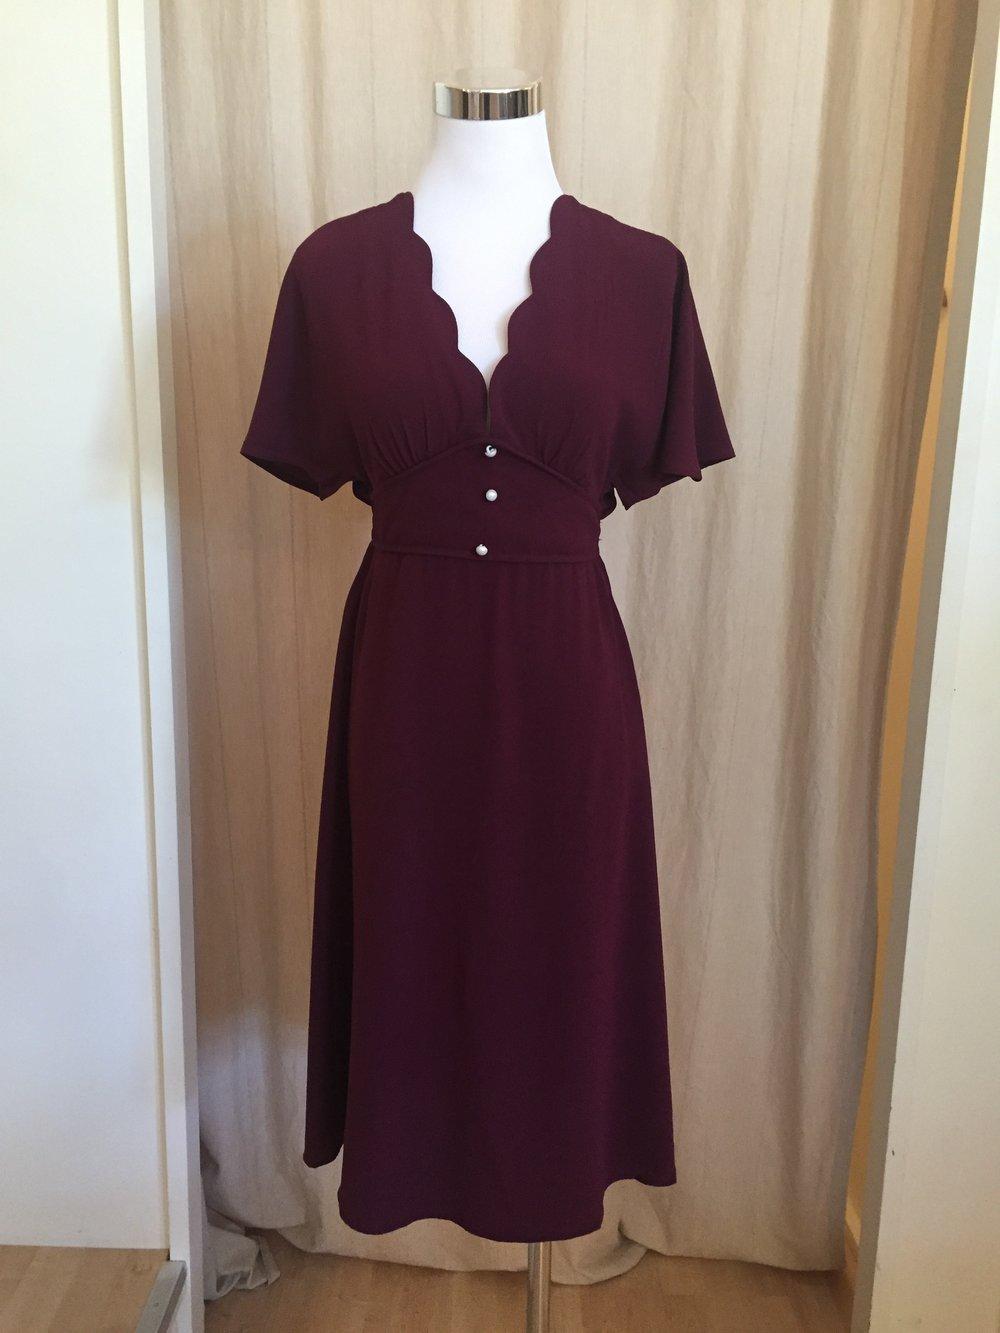 Scallop Edge Burgundy Dress, $38